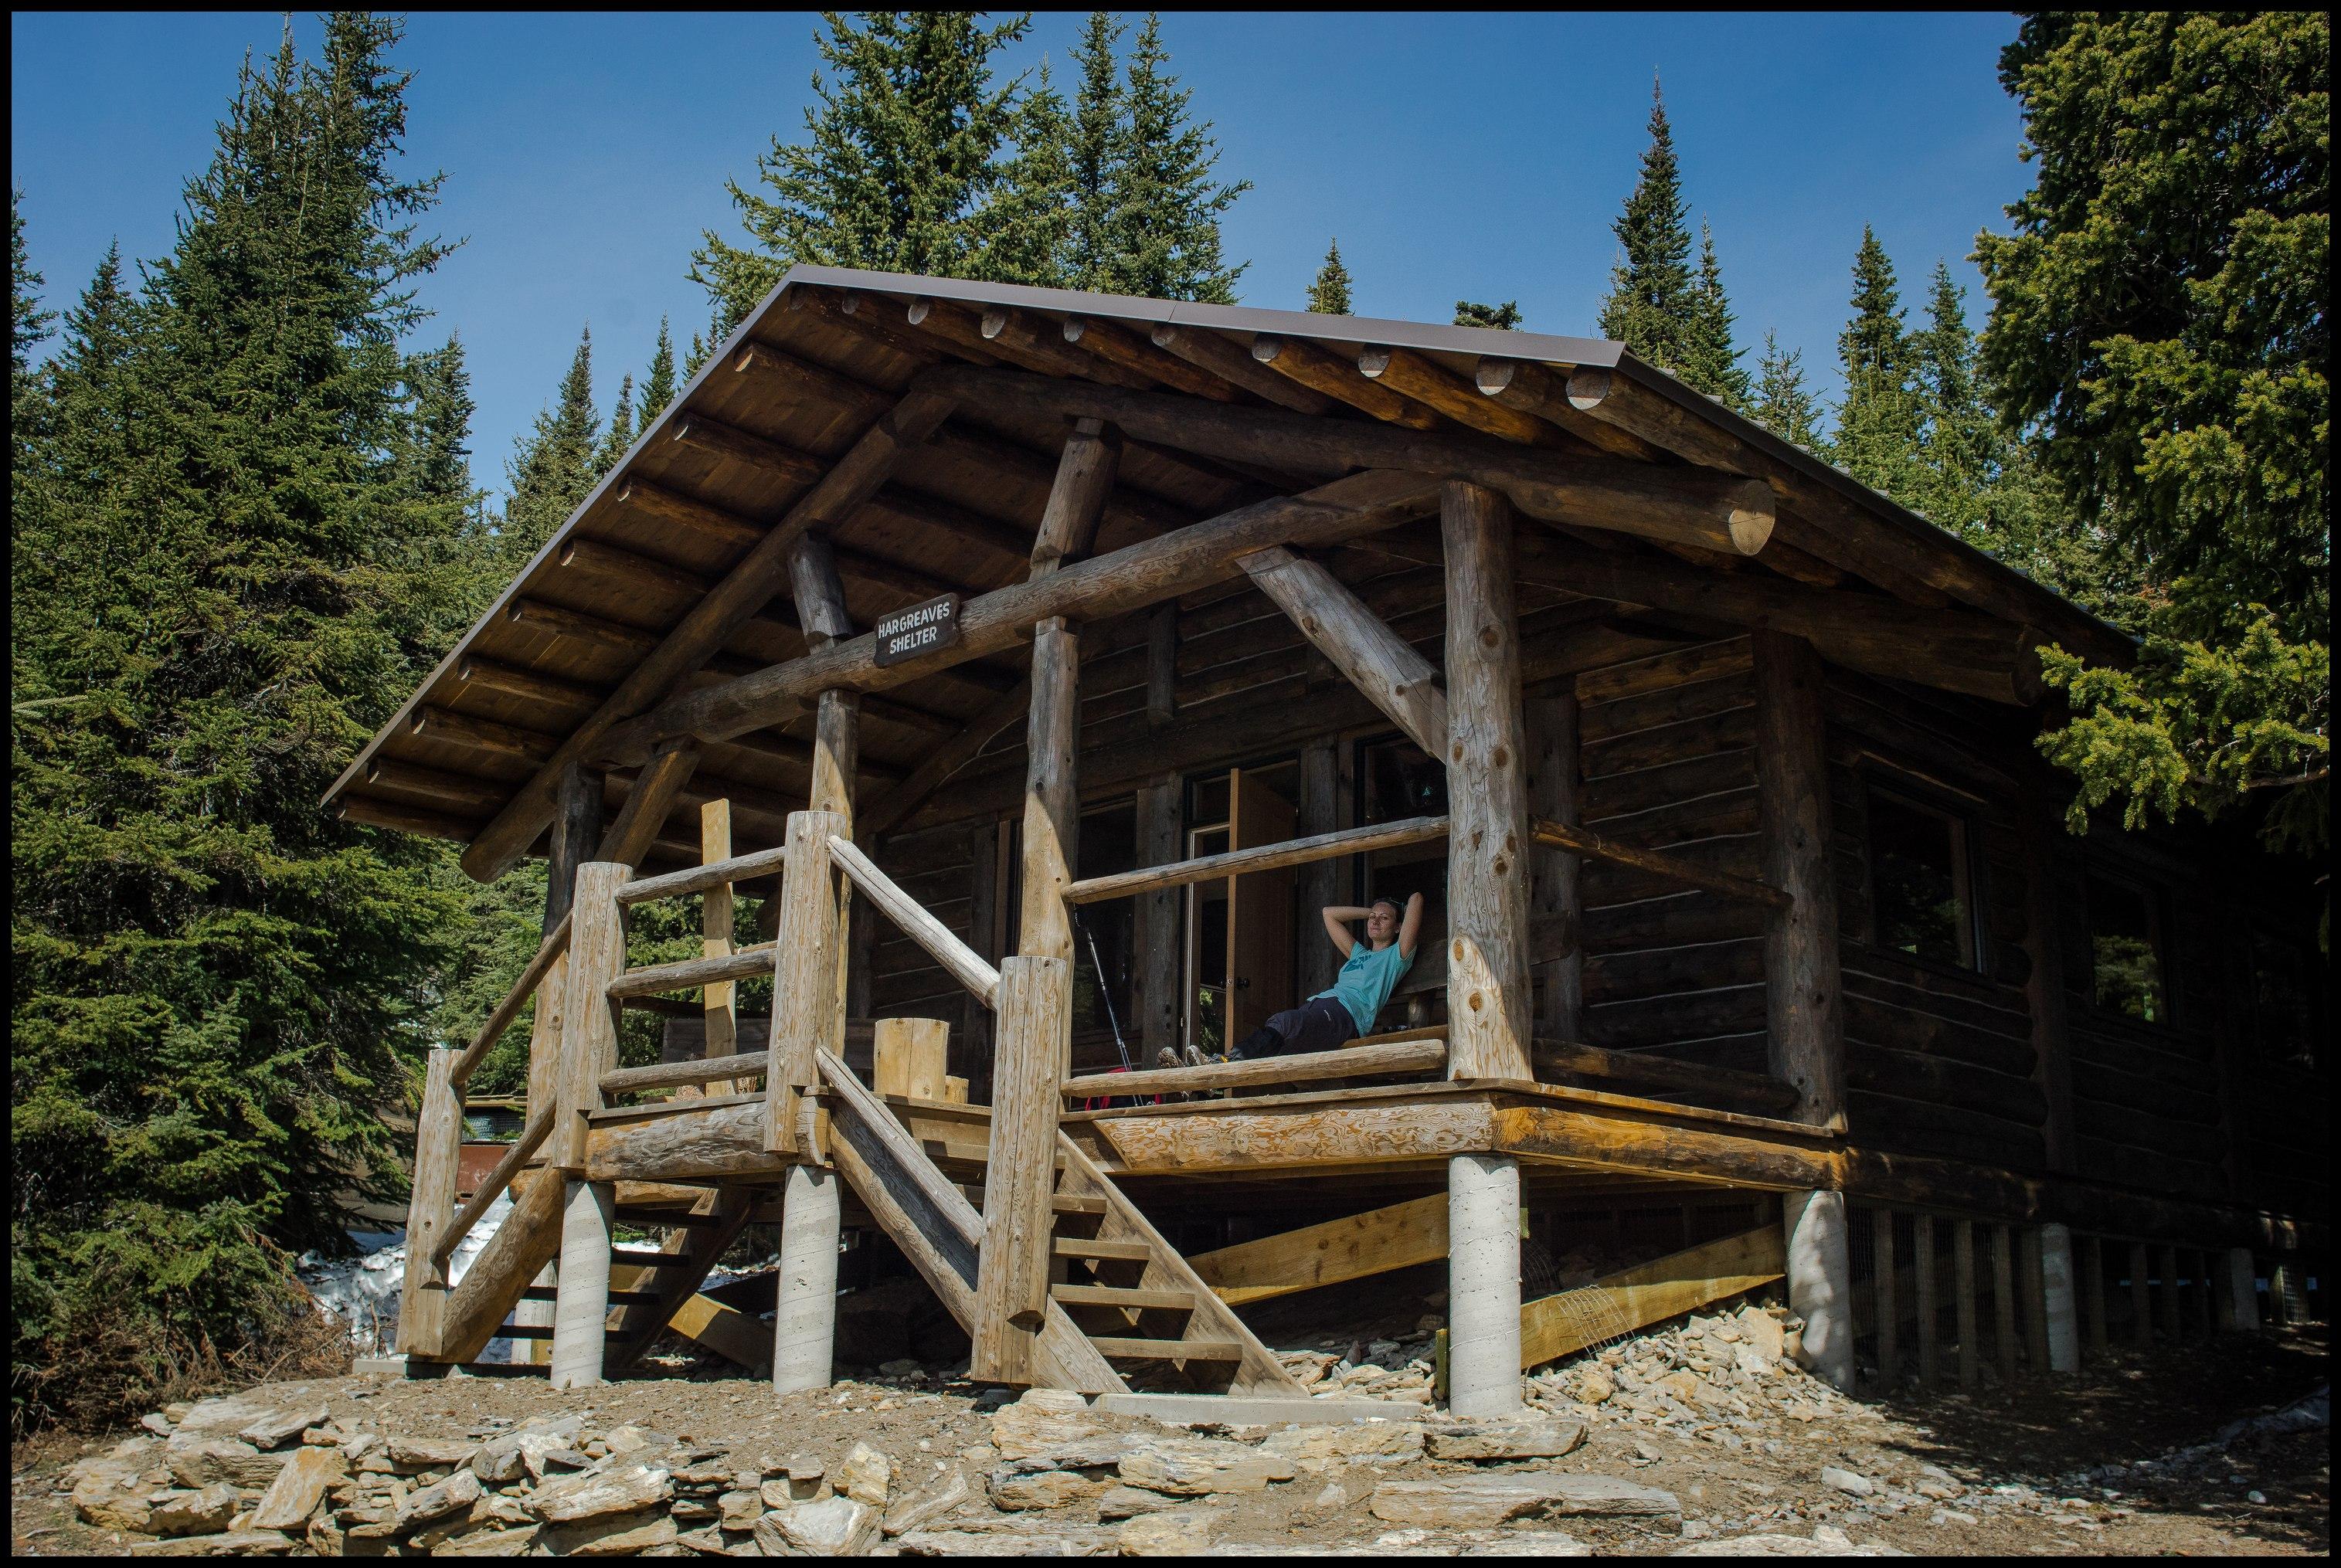 Enjoying the excellent new hut at Berg Lake campsite, Sony A7 / Canon FD Tilt Shift 35 Sony A7 / Canon FD Tilt Shift 35 2.8